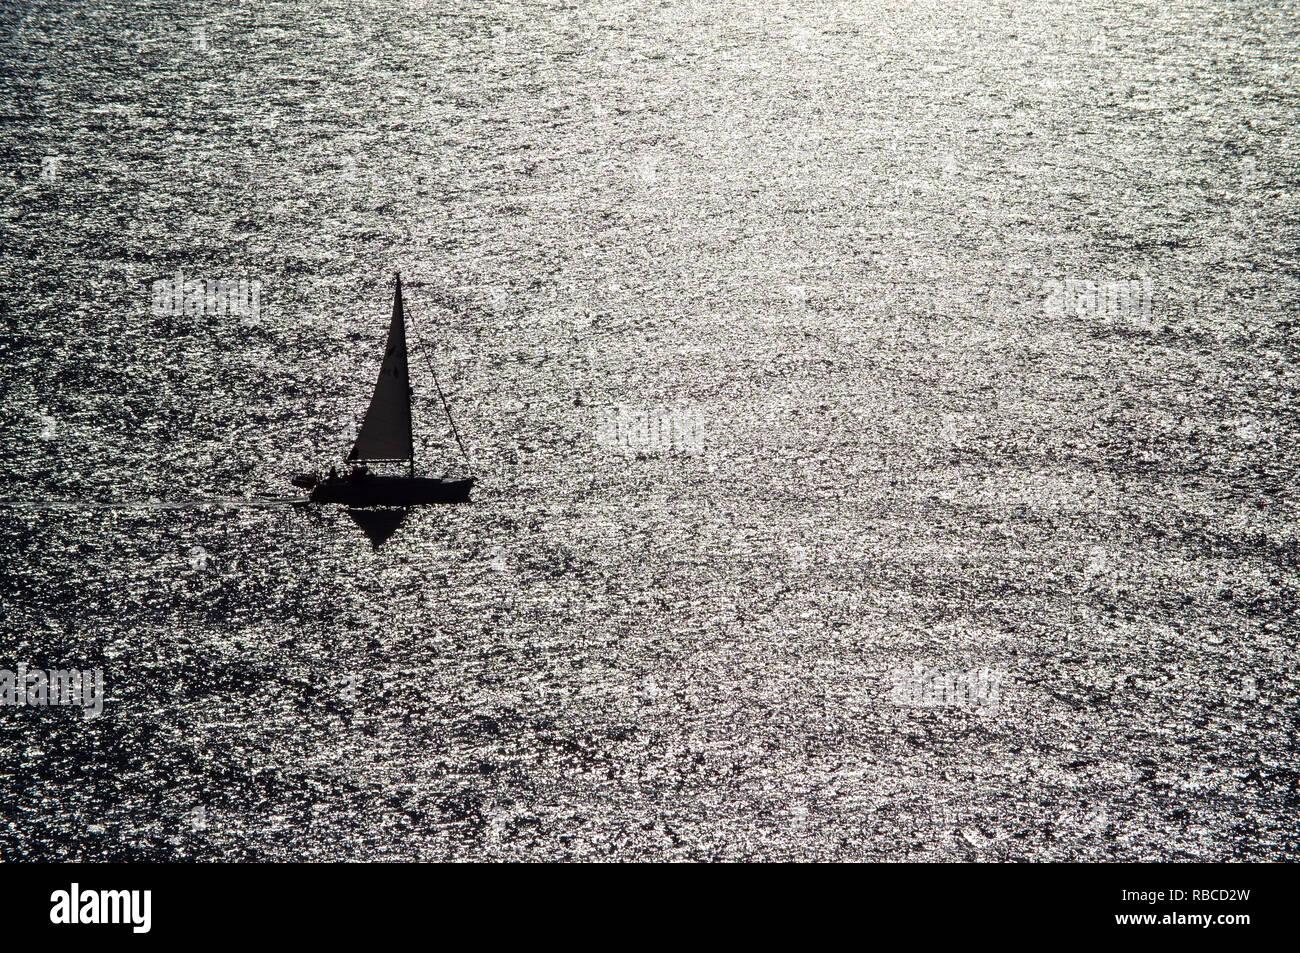 Small sailing boat on shining sea. - Stock Image